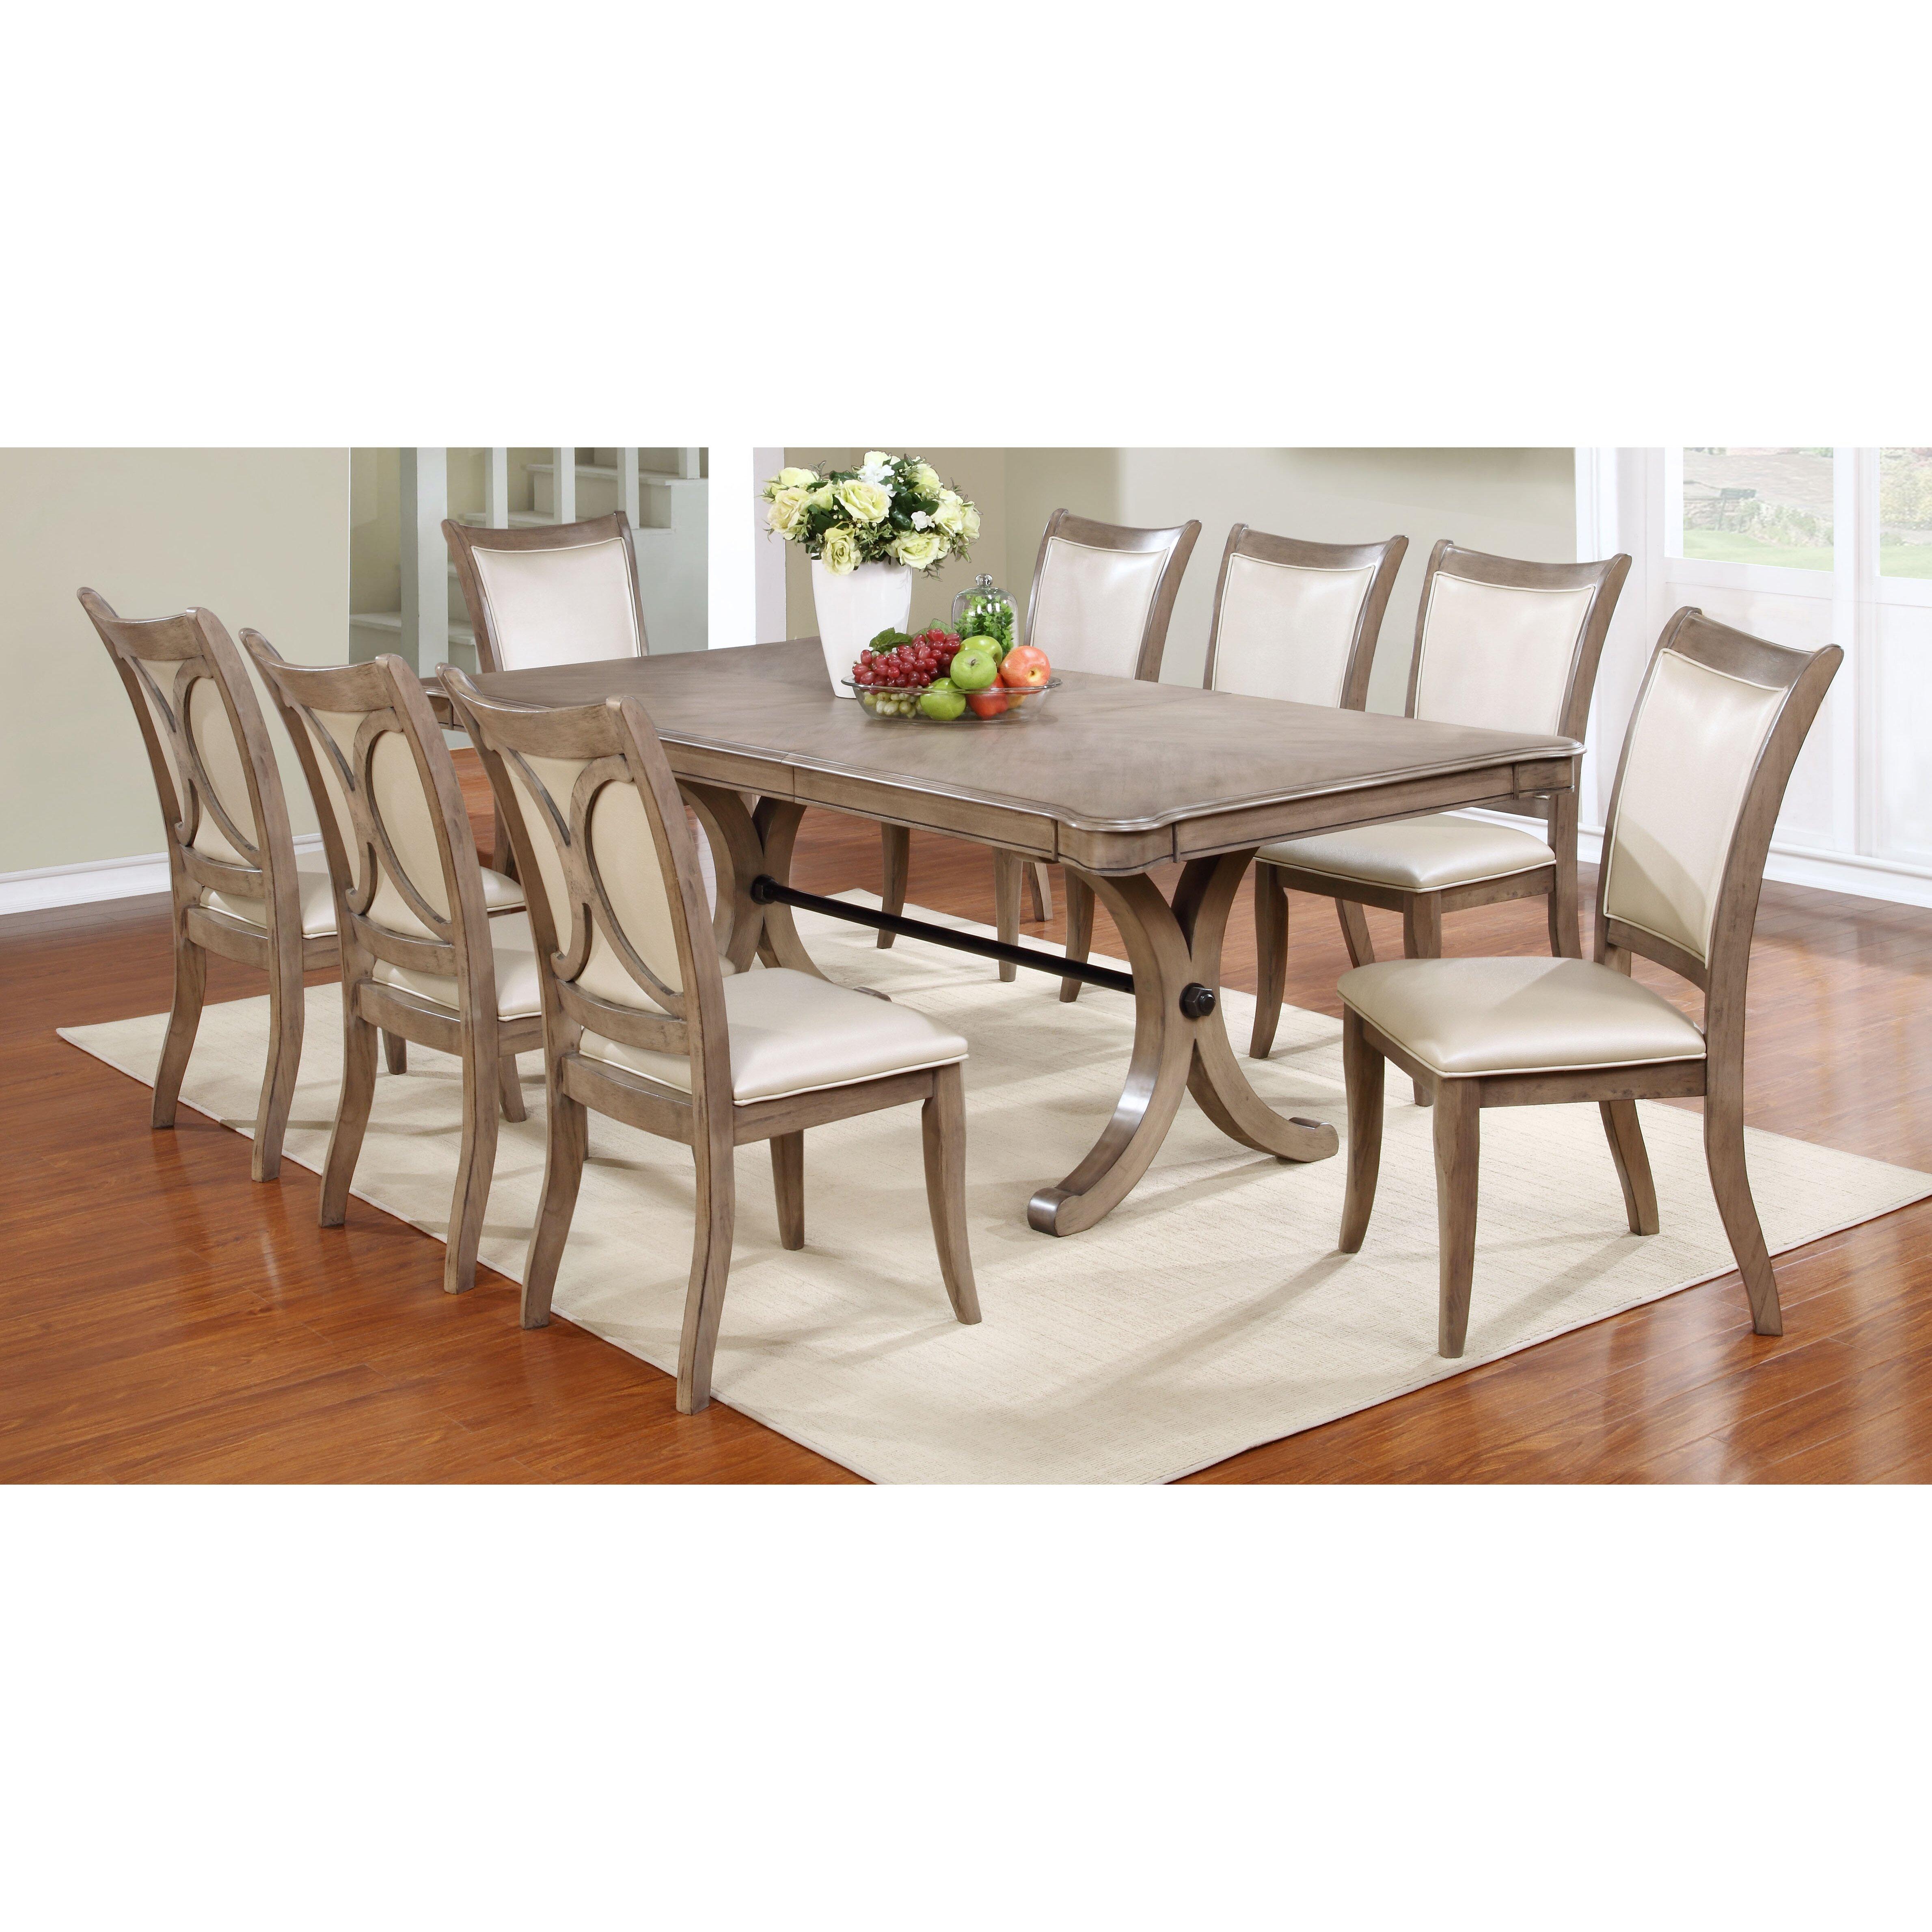 Rosalind wheeler regina 9 piece dining set reviews wayfair for Dining room tables 9 piece